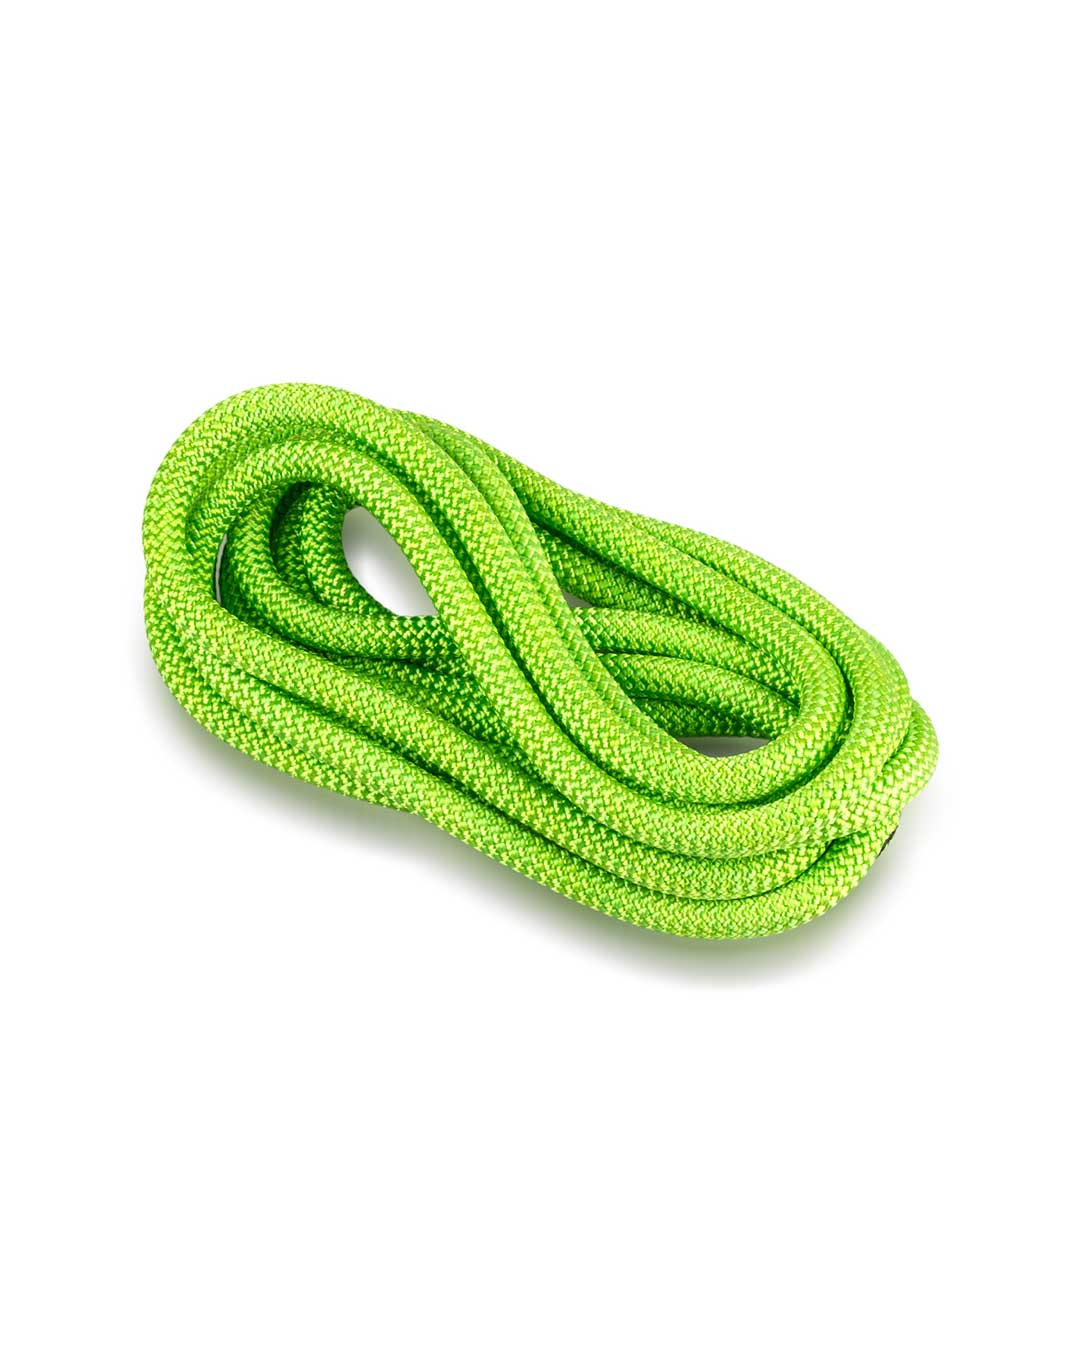 Cuerda de gimnasia rítmica VENTURELLI (Certificada FIG) verde neón - 3 m